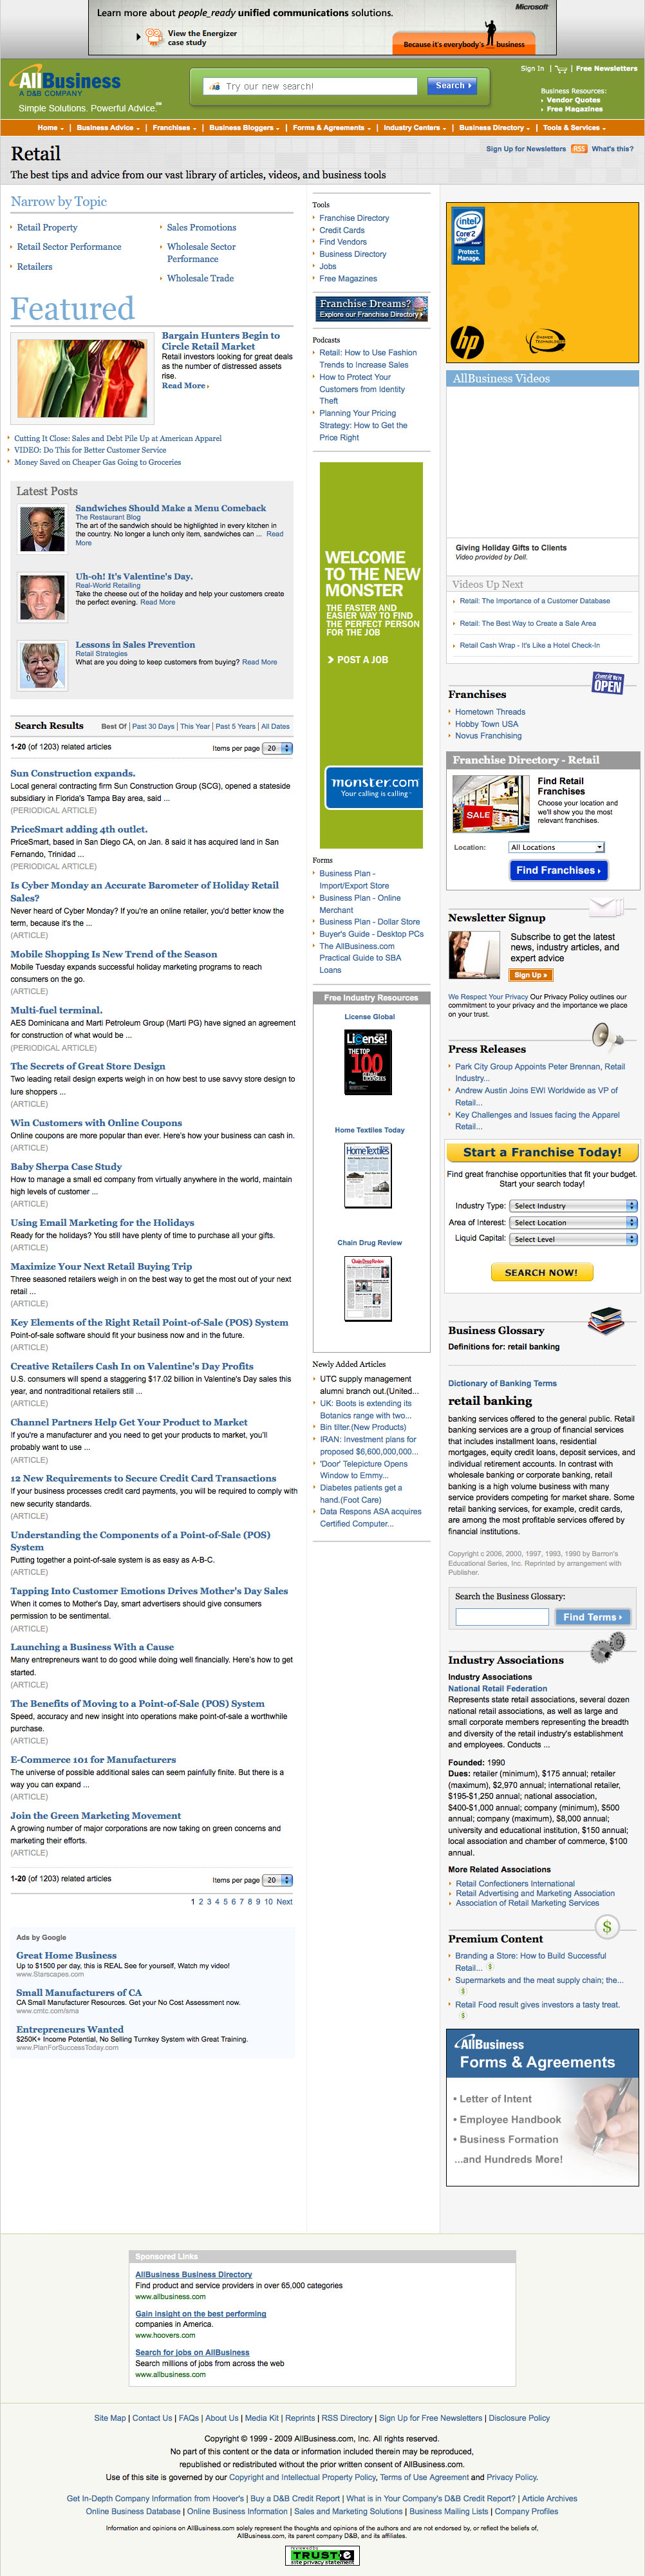 Eric Pedersen: AllBusiness Industry Page